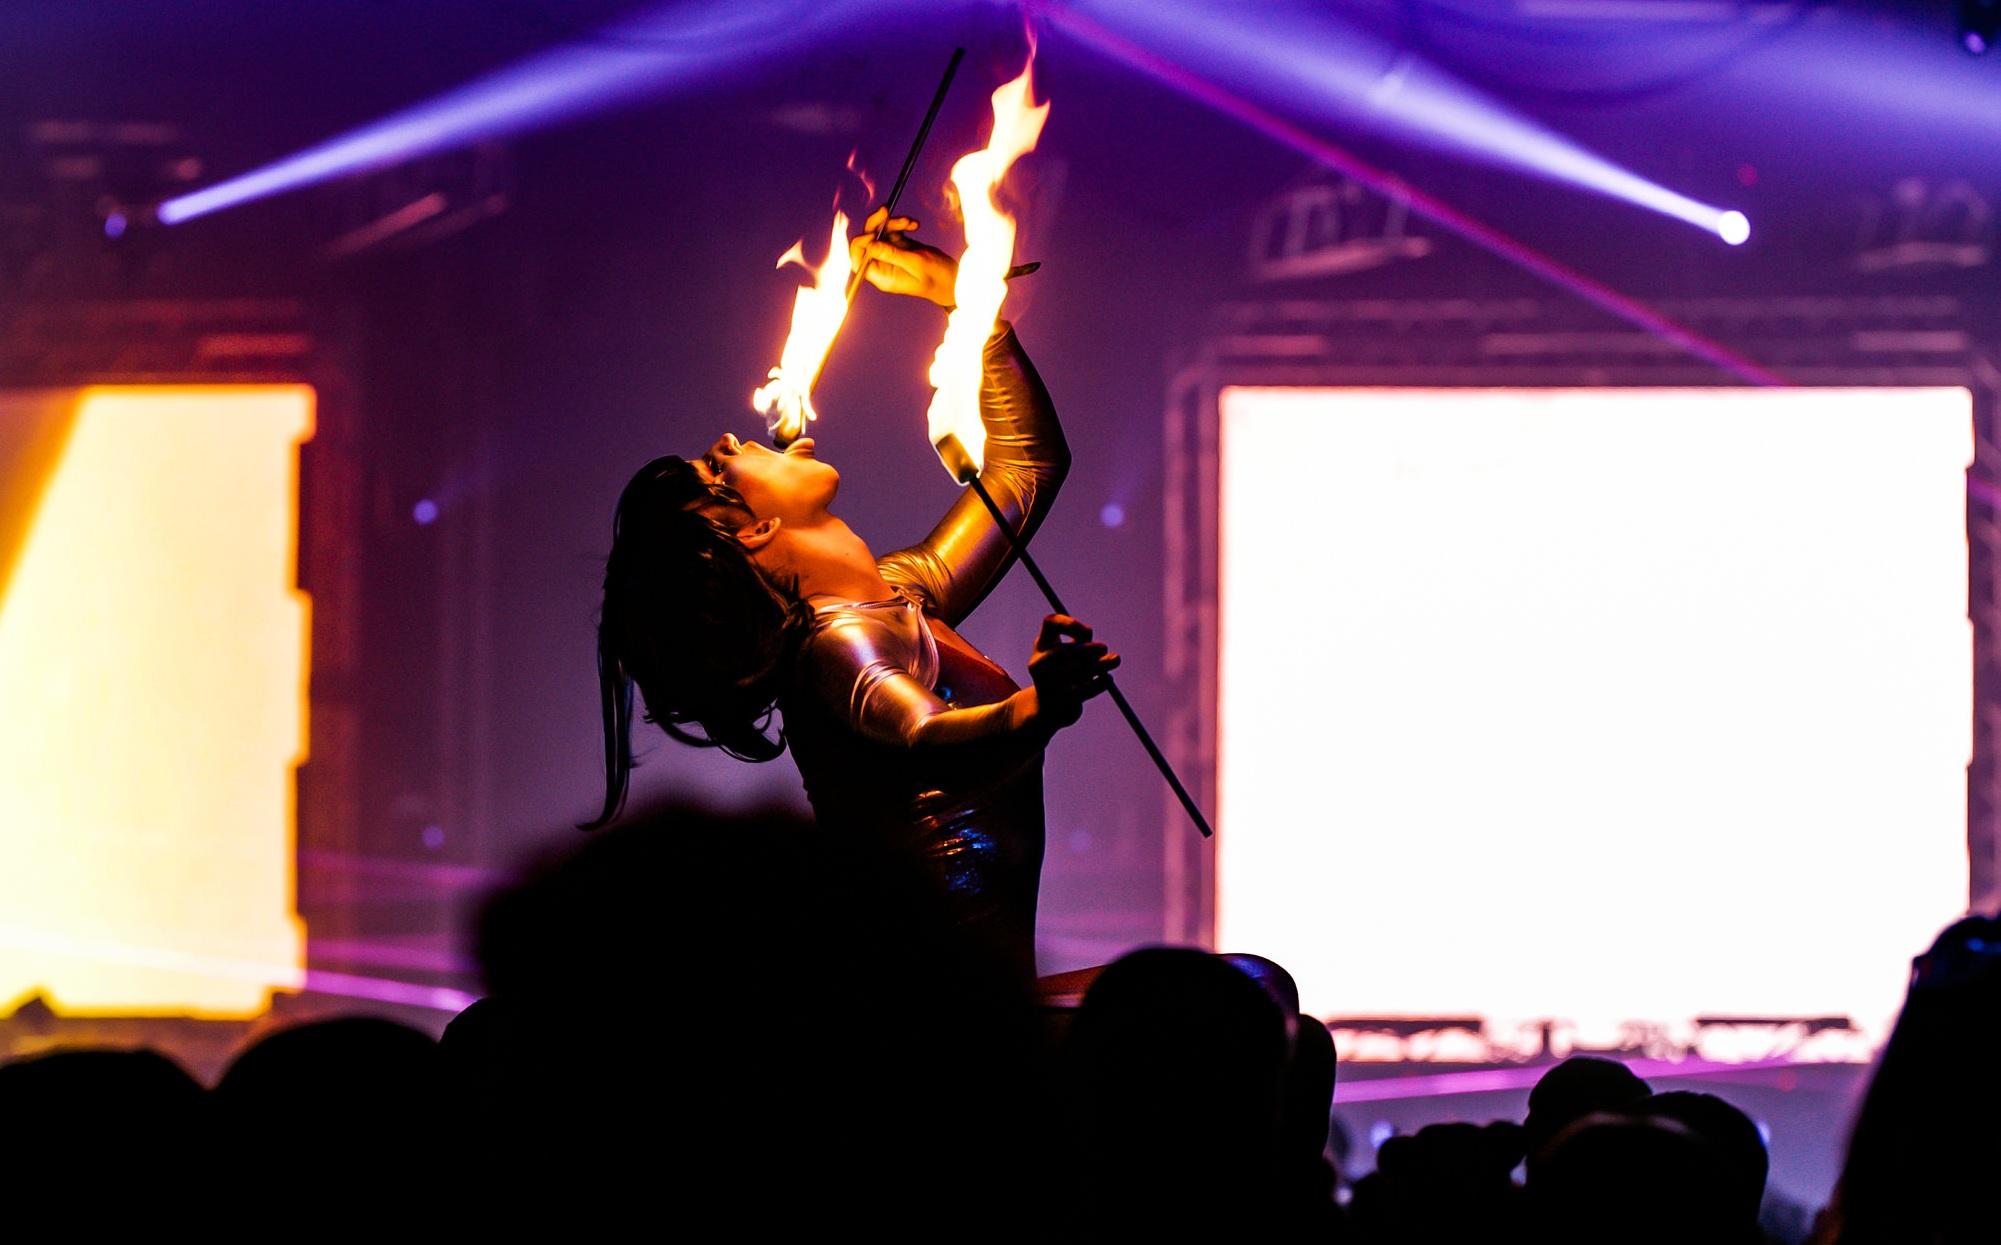 Fire dancer at Lights All Night 2018